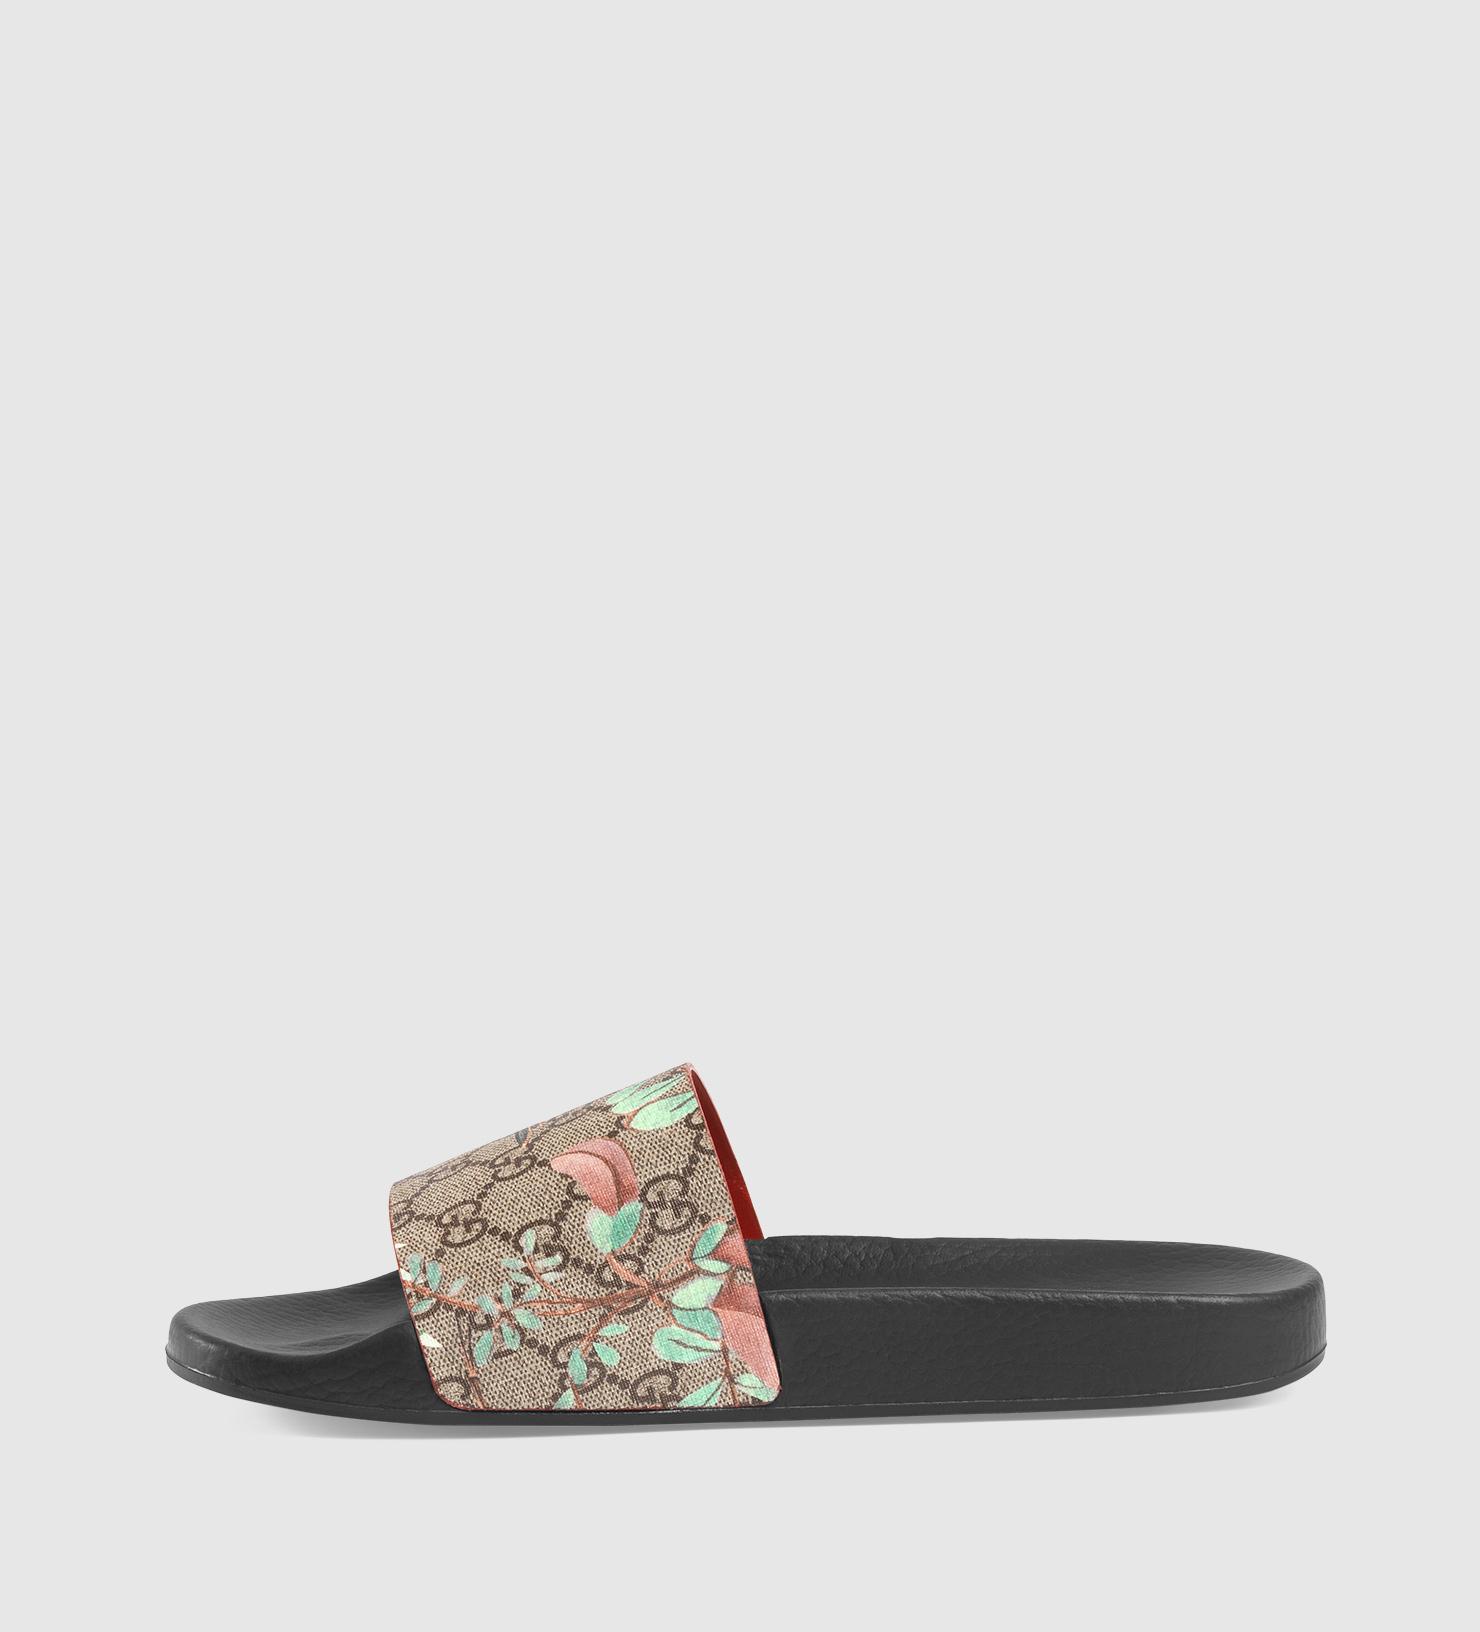 fd2f0aef8d8 Gucci Men s Tian Slide Sandal in Gray for Men - Lyst